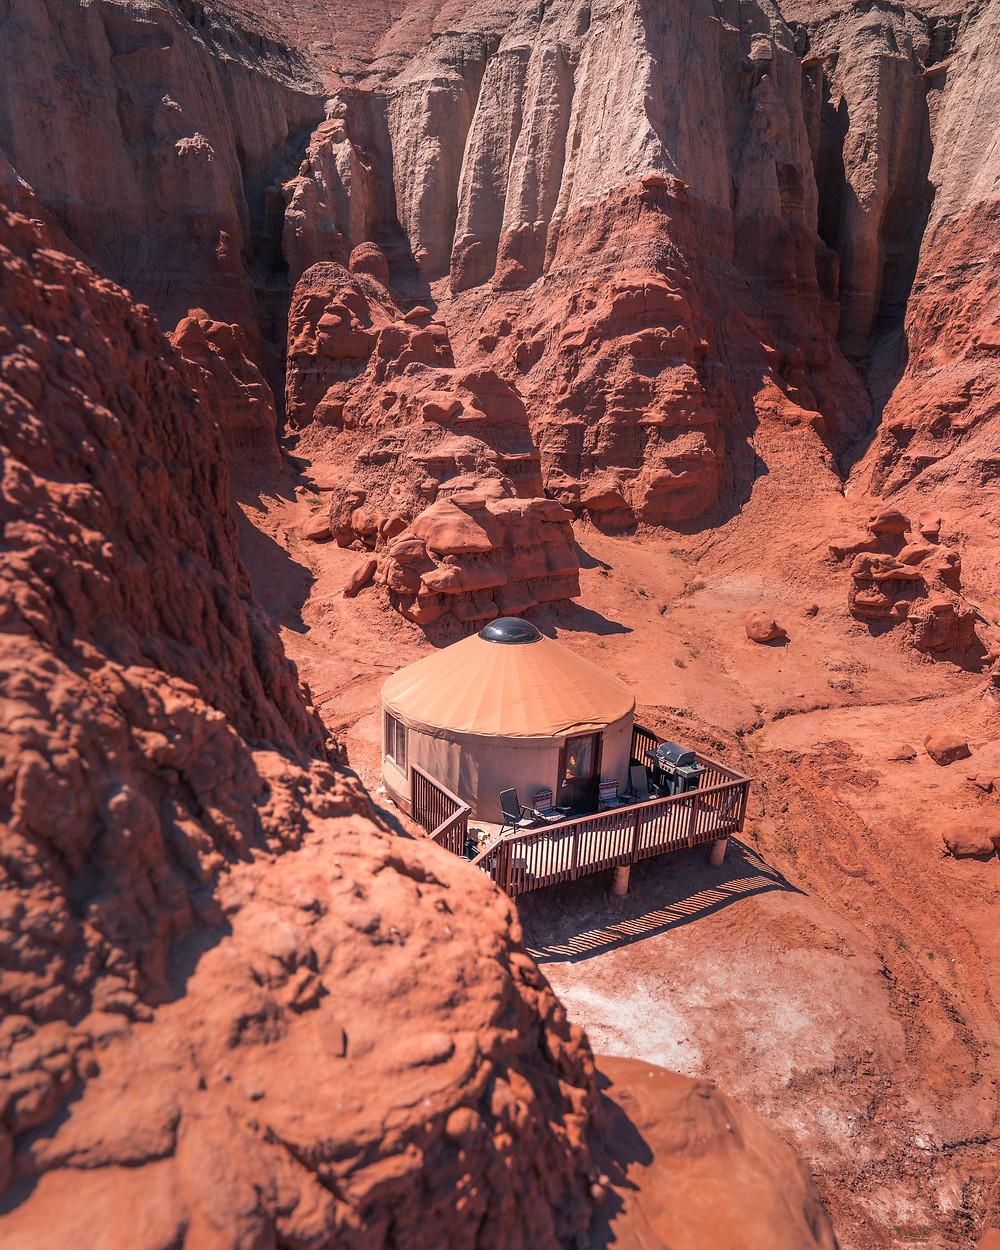 Yurt next to the Red Rock Cliffs in Utah